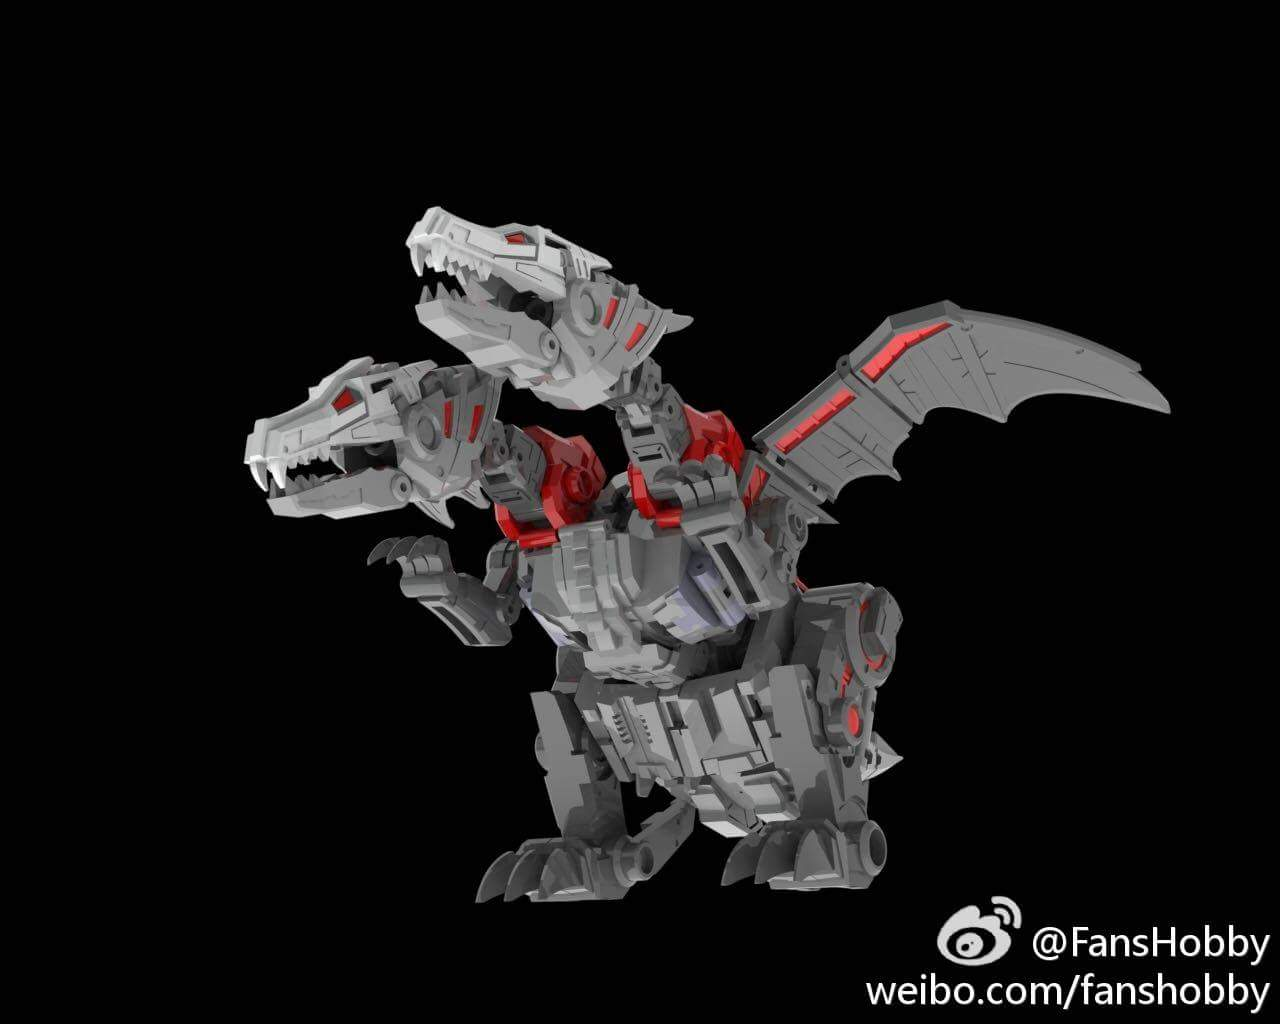 [FansHobby] Produit Tiers - Master Builder MB-02/03/05 - aka Monsterbots/Monstrebots - Page 2 UXkP8axK